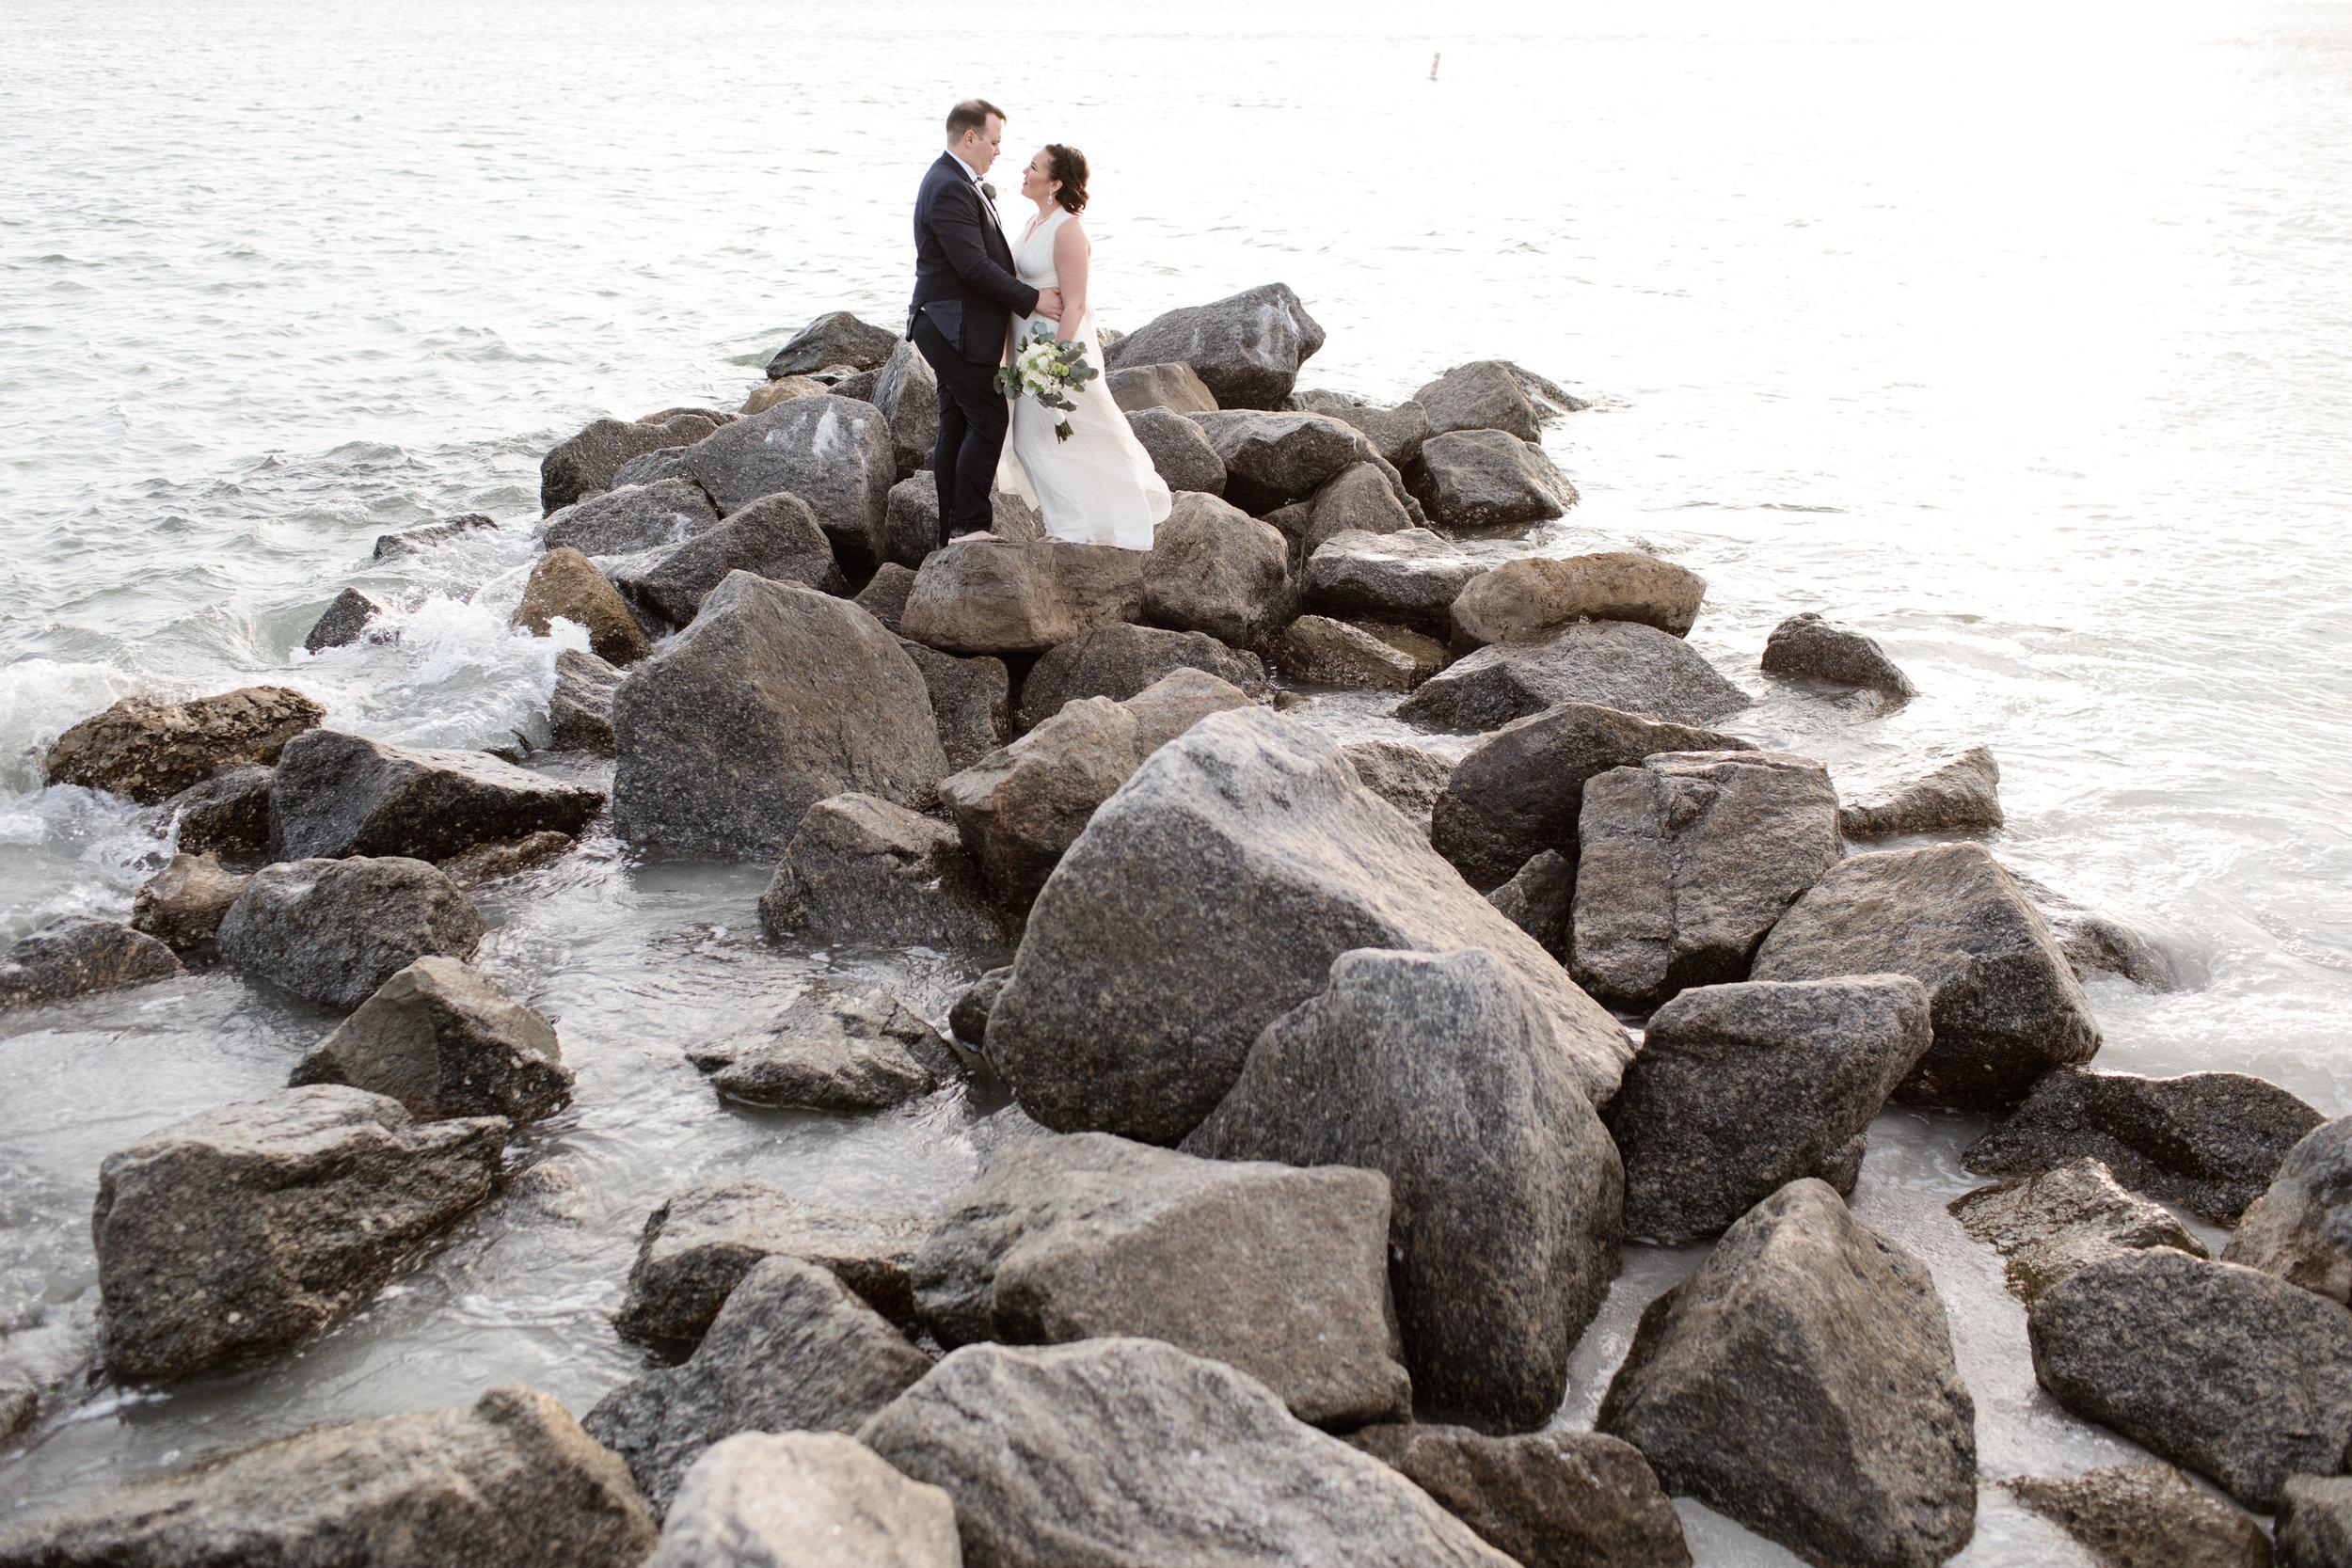 Beltran_Treasure_Island_Elopement_Tampa_Wedding_113-1.jpg